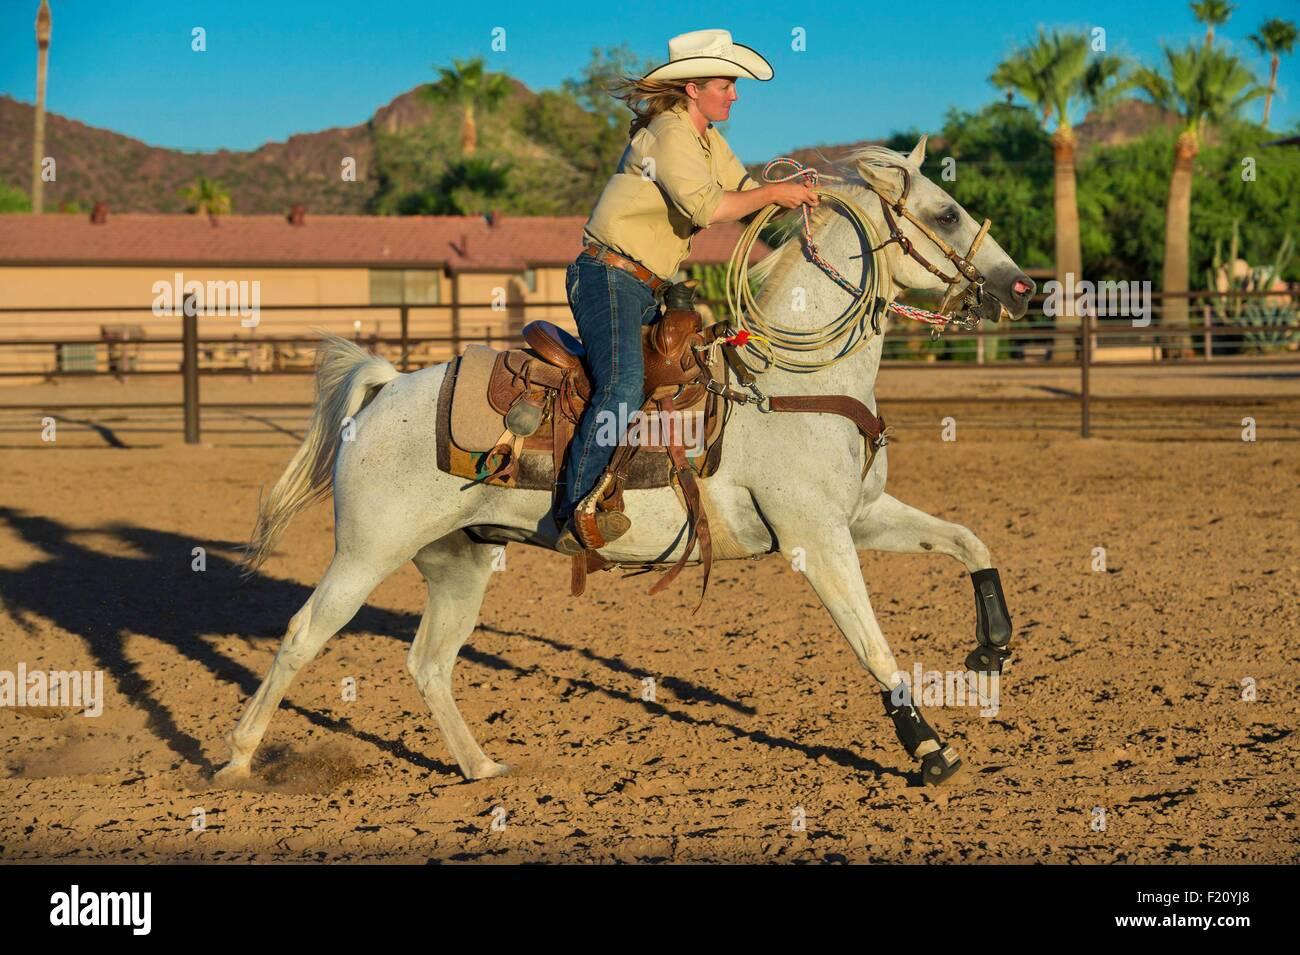 United States, Arizona, Tucson, White Stallion Ranch - Stock Image